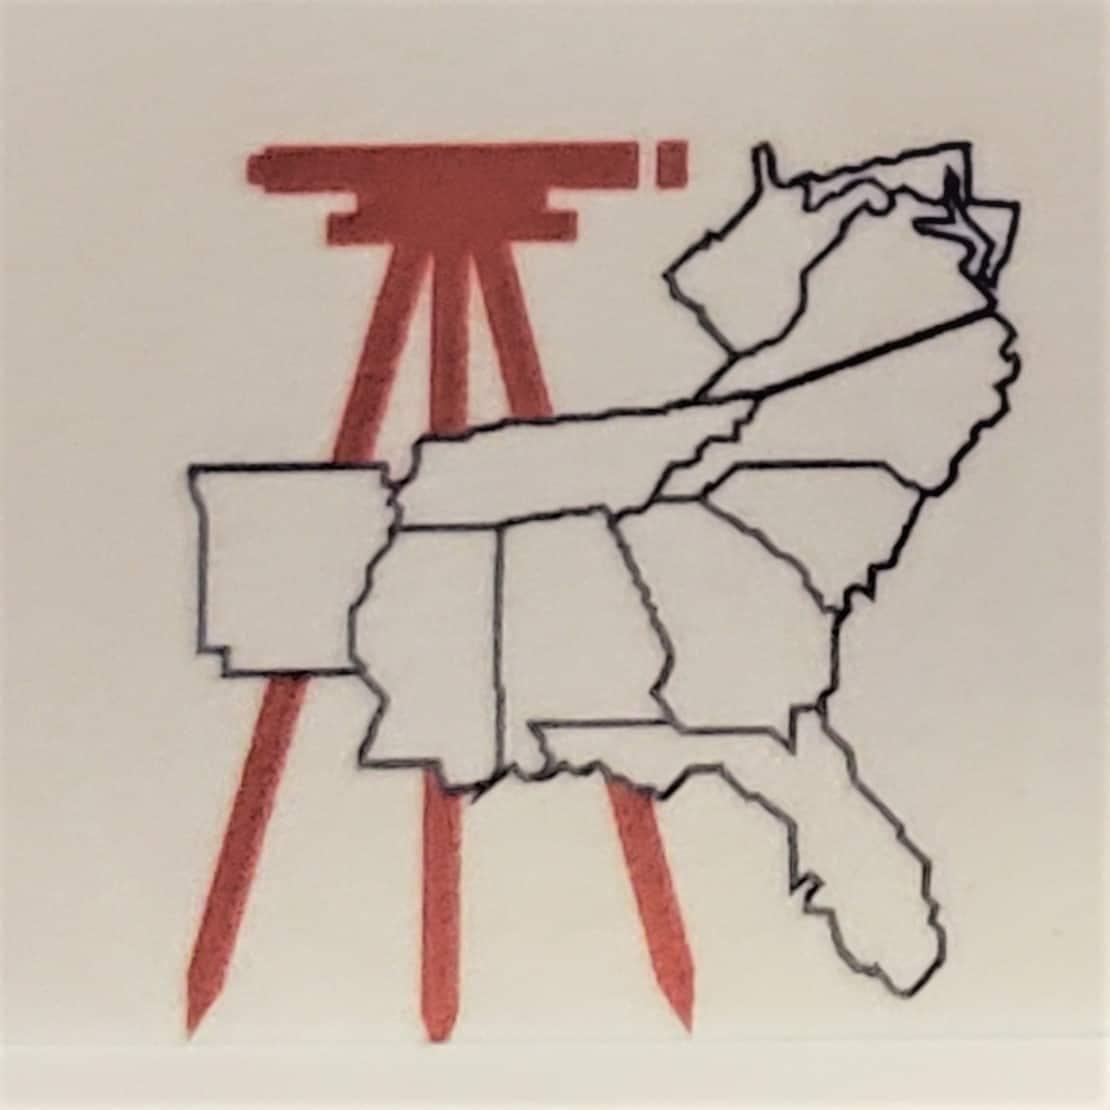 21st Century Surveying, LLC